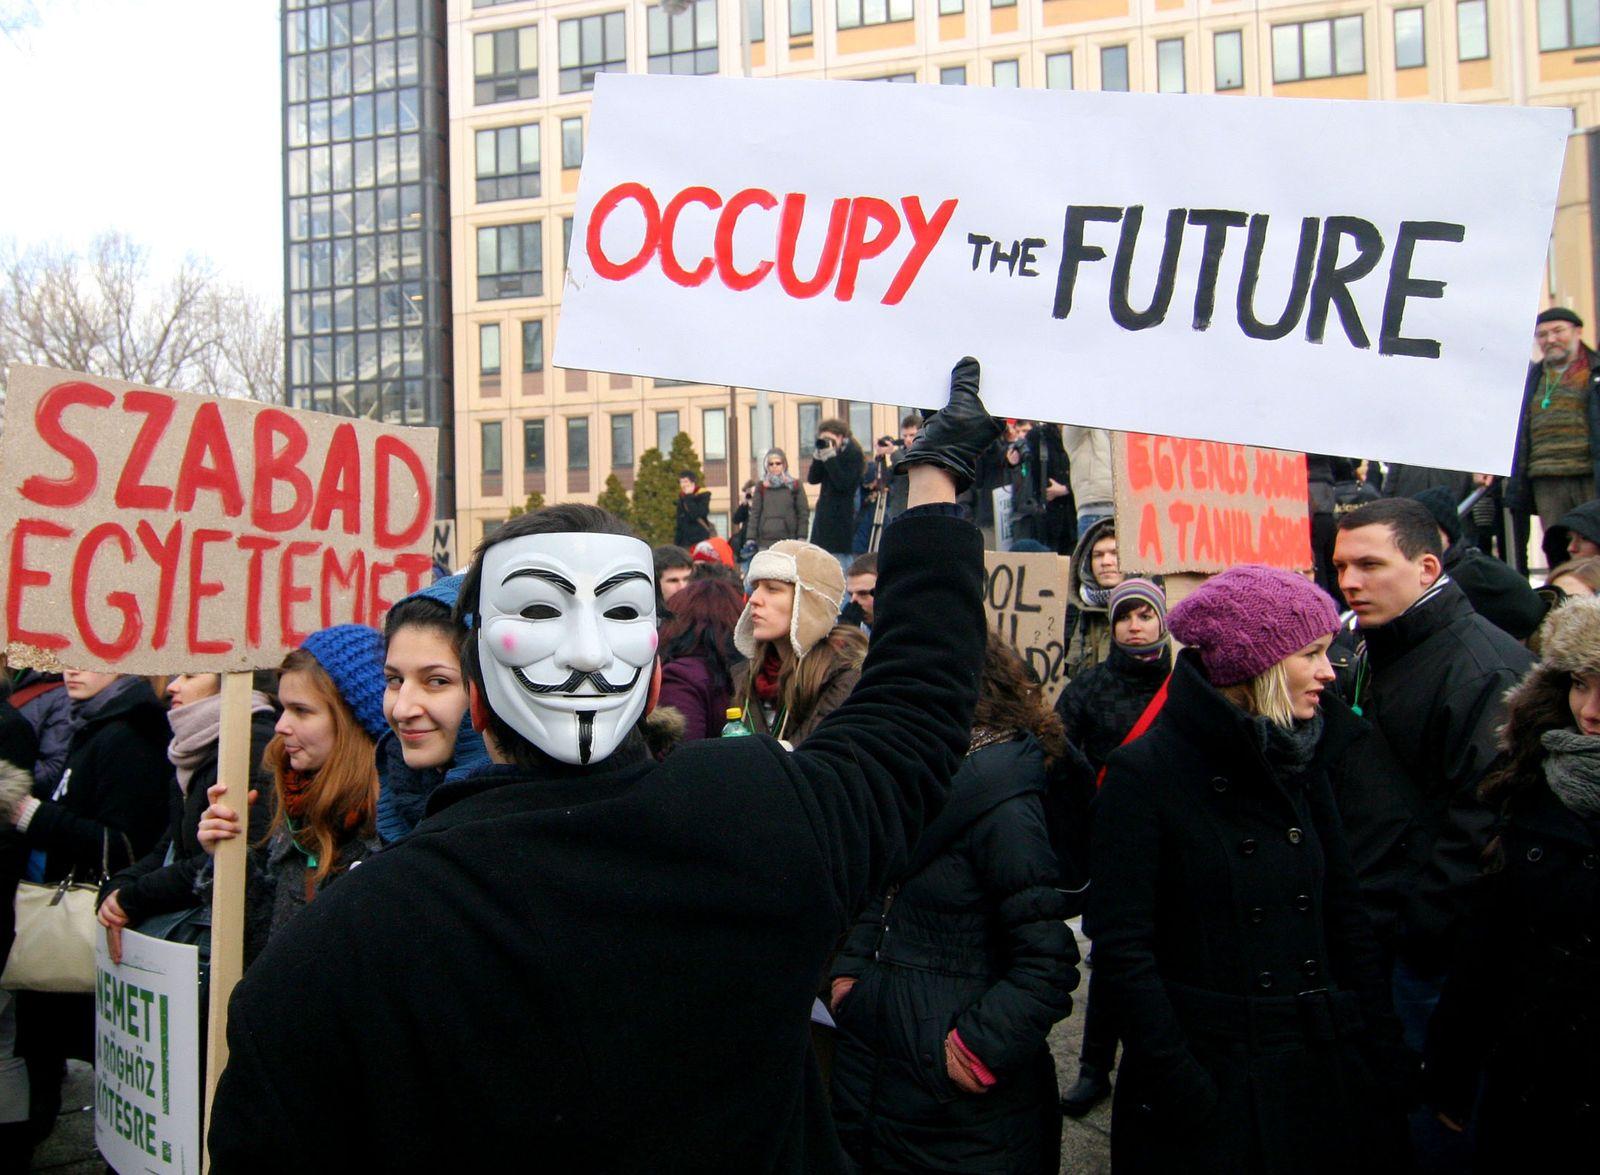 NUR FÜR SPAM HUNGARY-EDUCATION-PROTEST